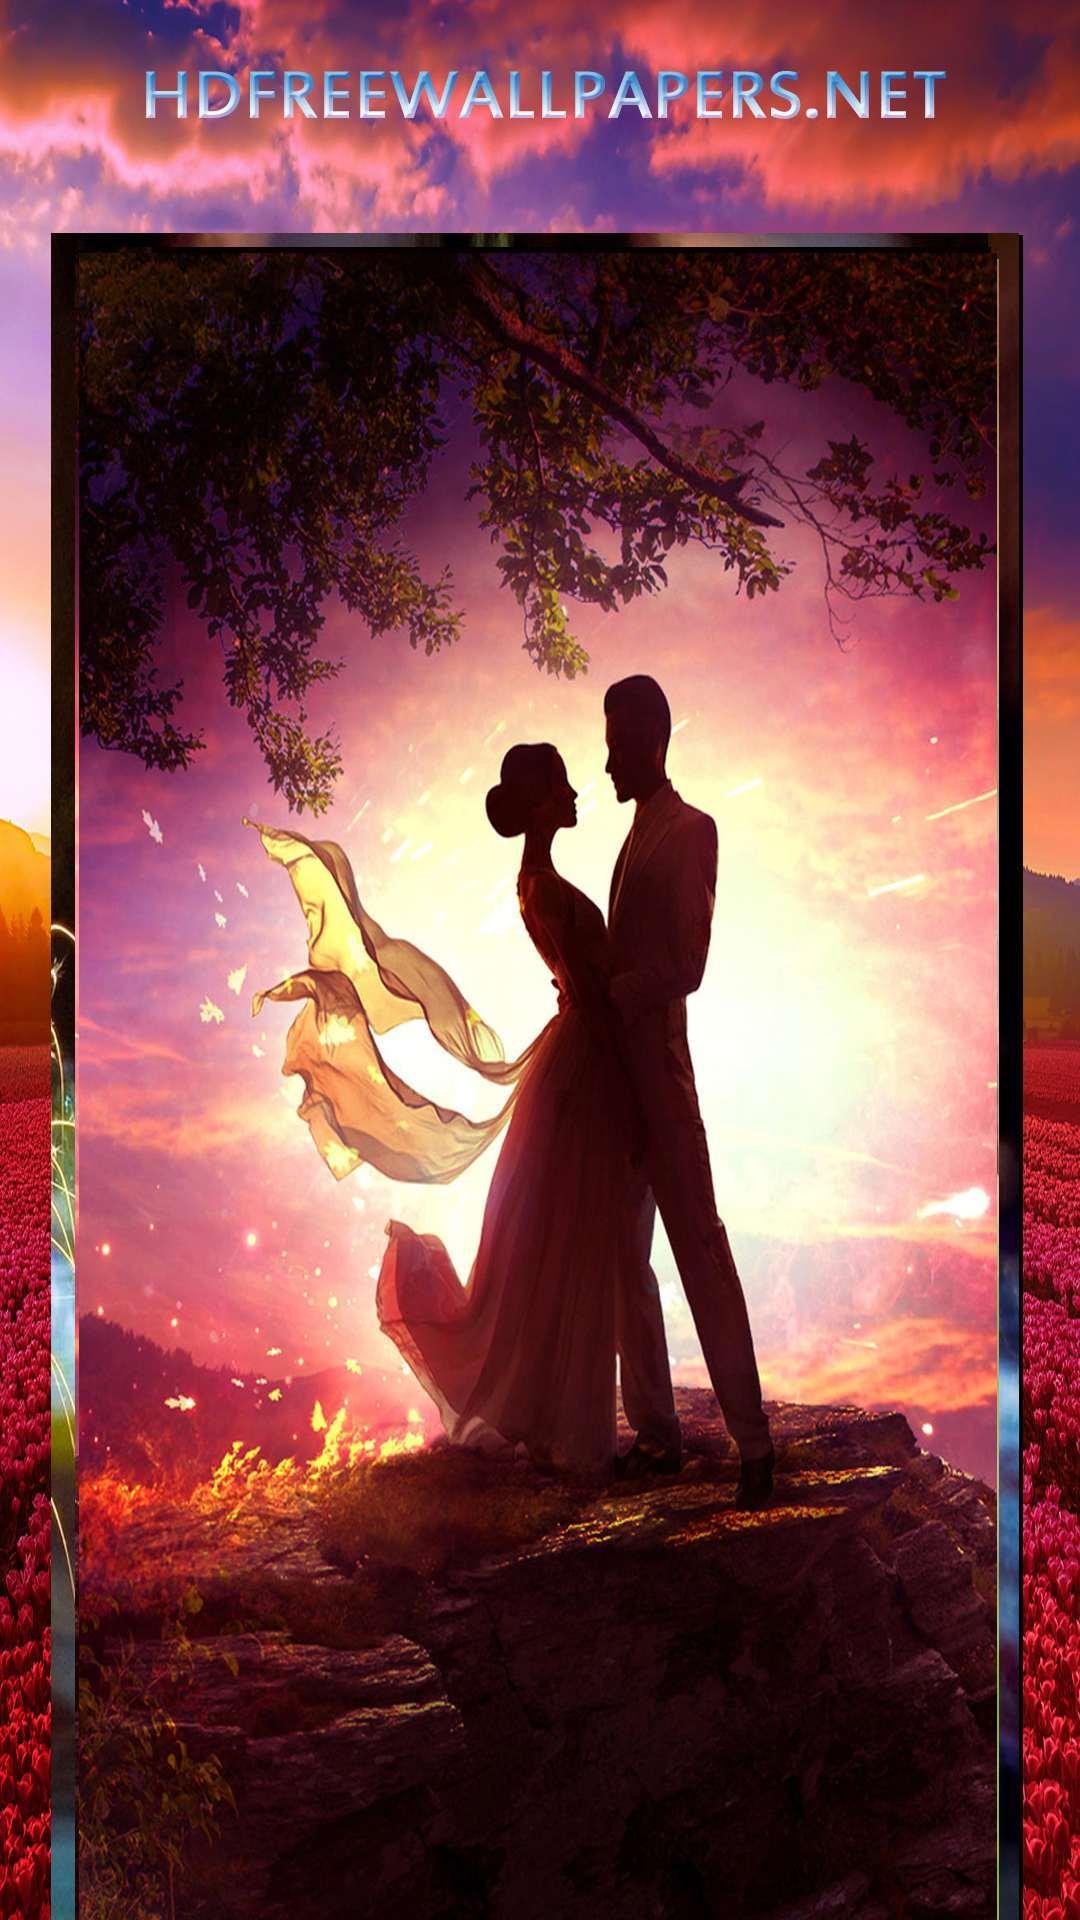 Hd Wallpaper Love Couple Image Download 1080x1920 Wallpaper Teahub Io